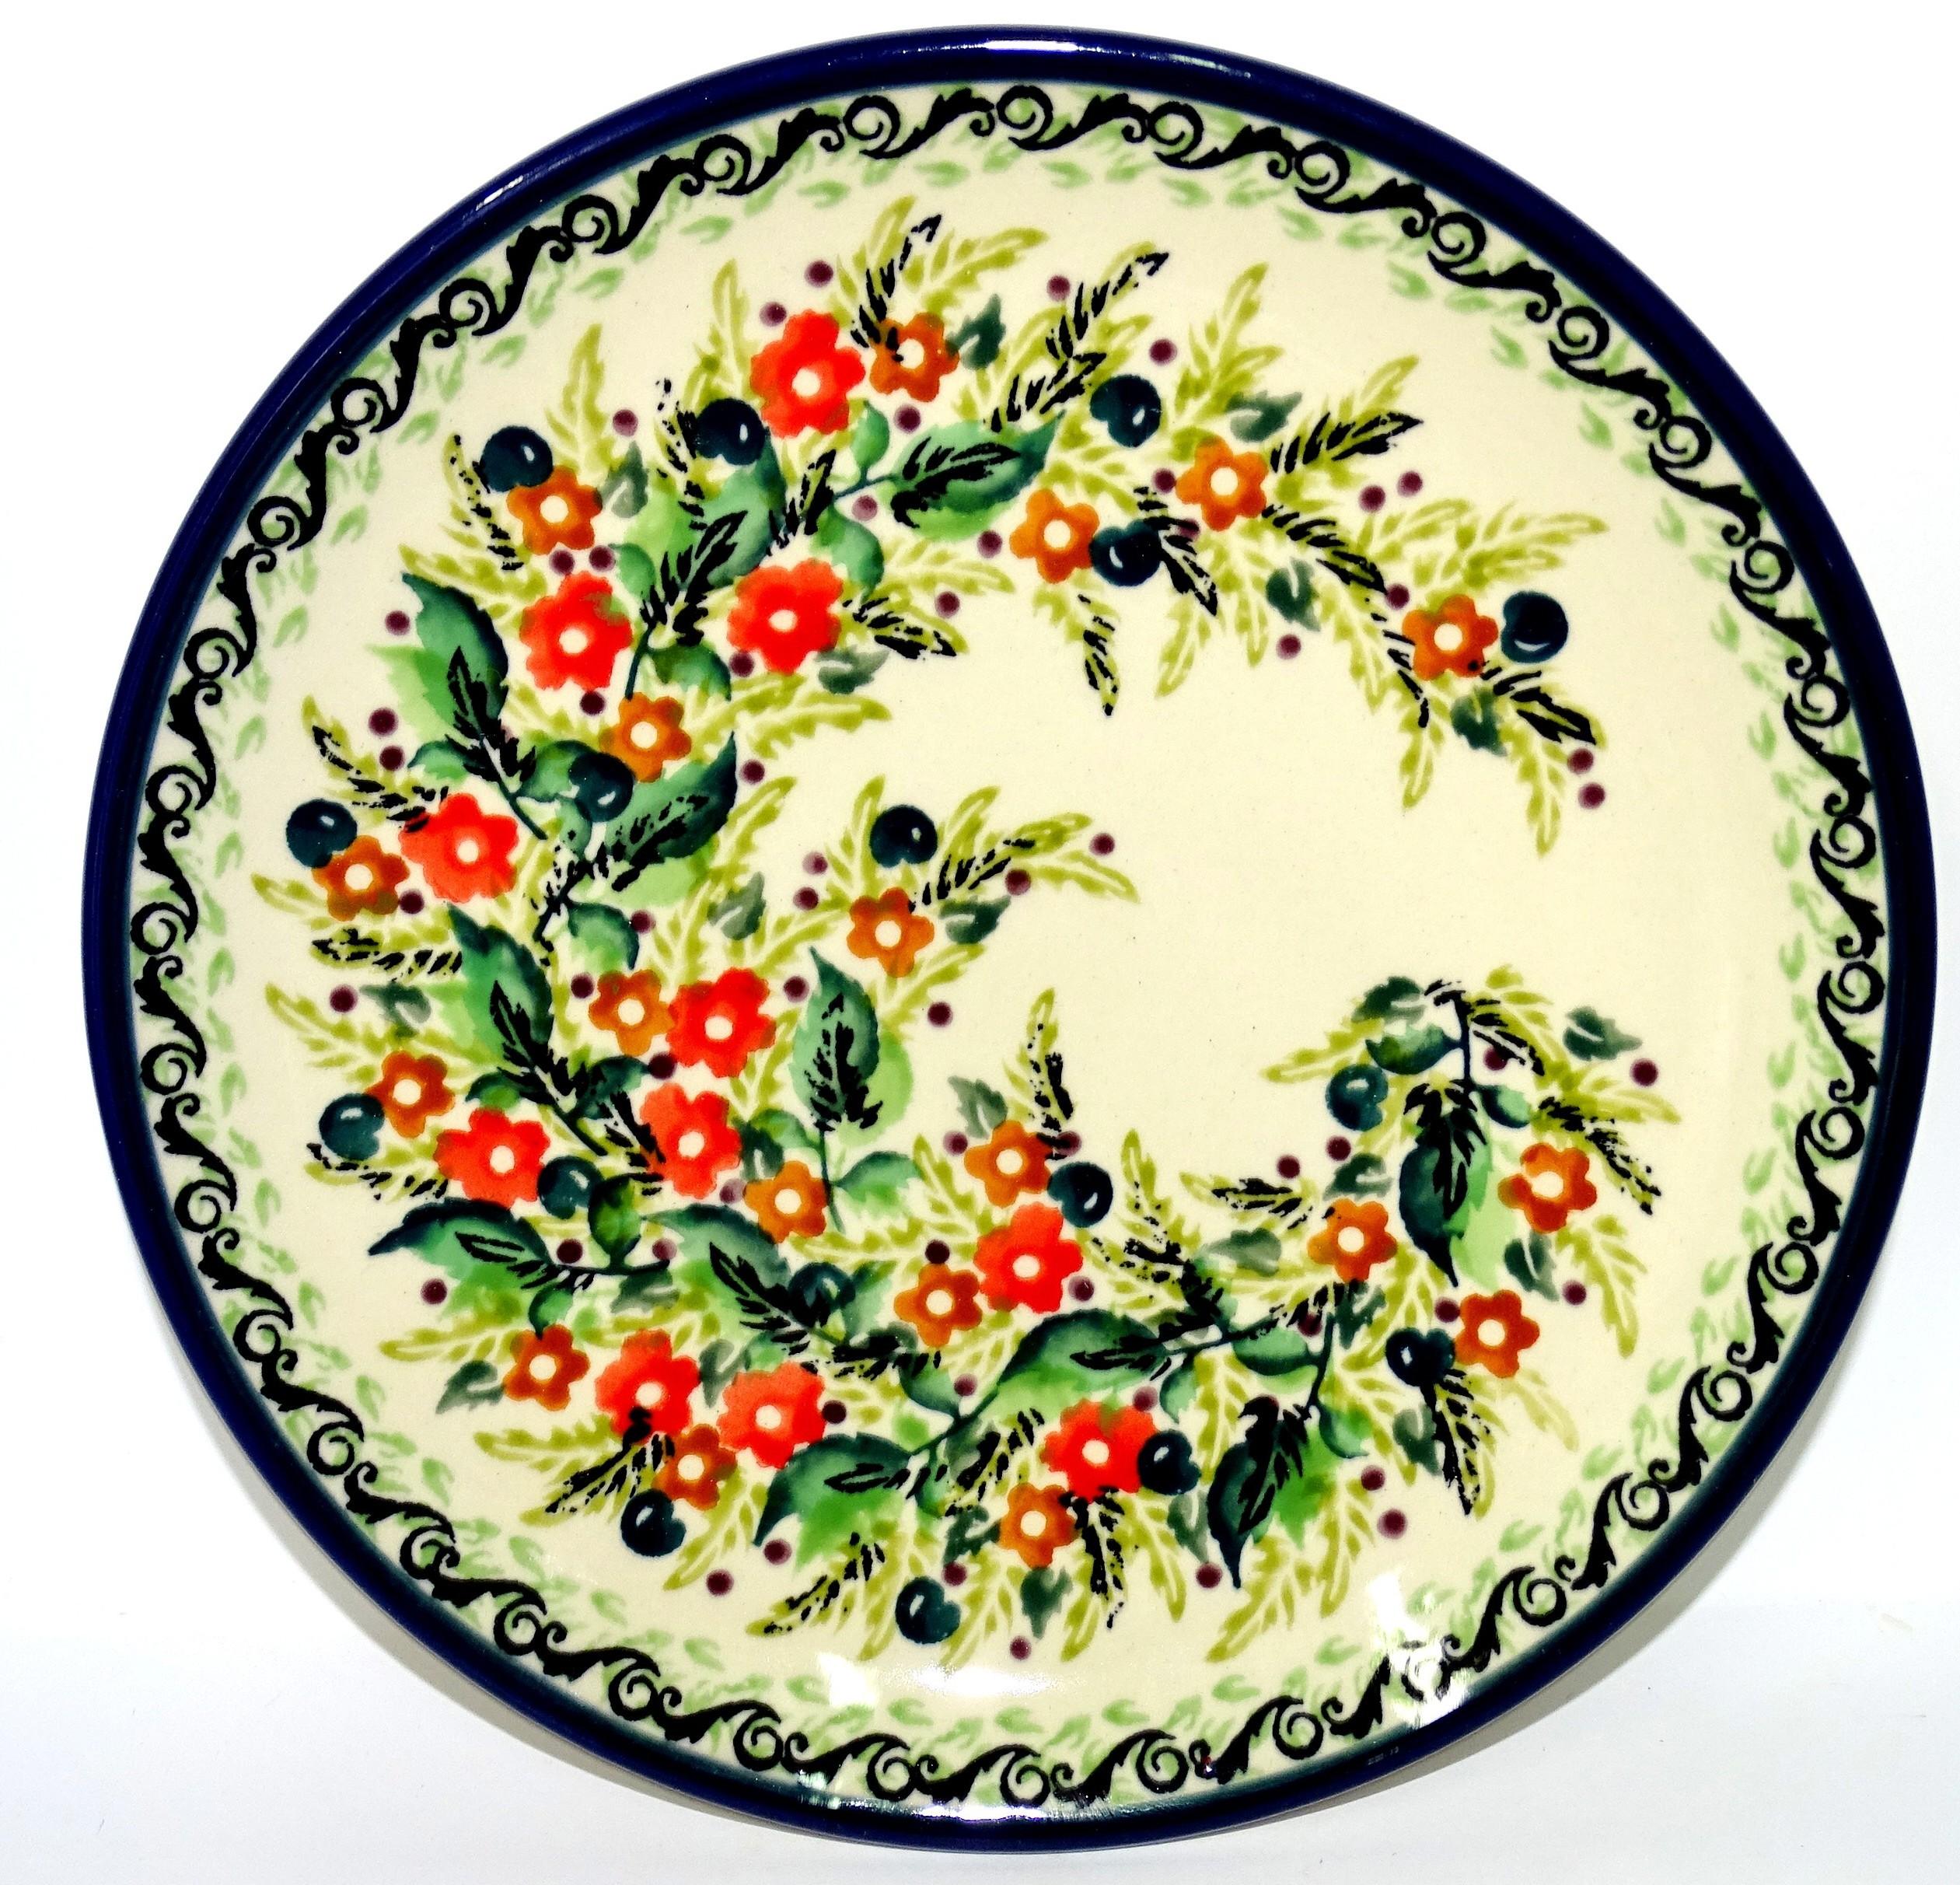 "Pottery Avenue 7.75"" SEASONS Stoneware Salad Plate   UNIKAT"